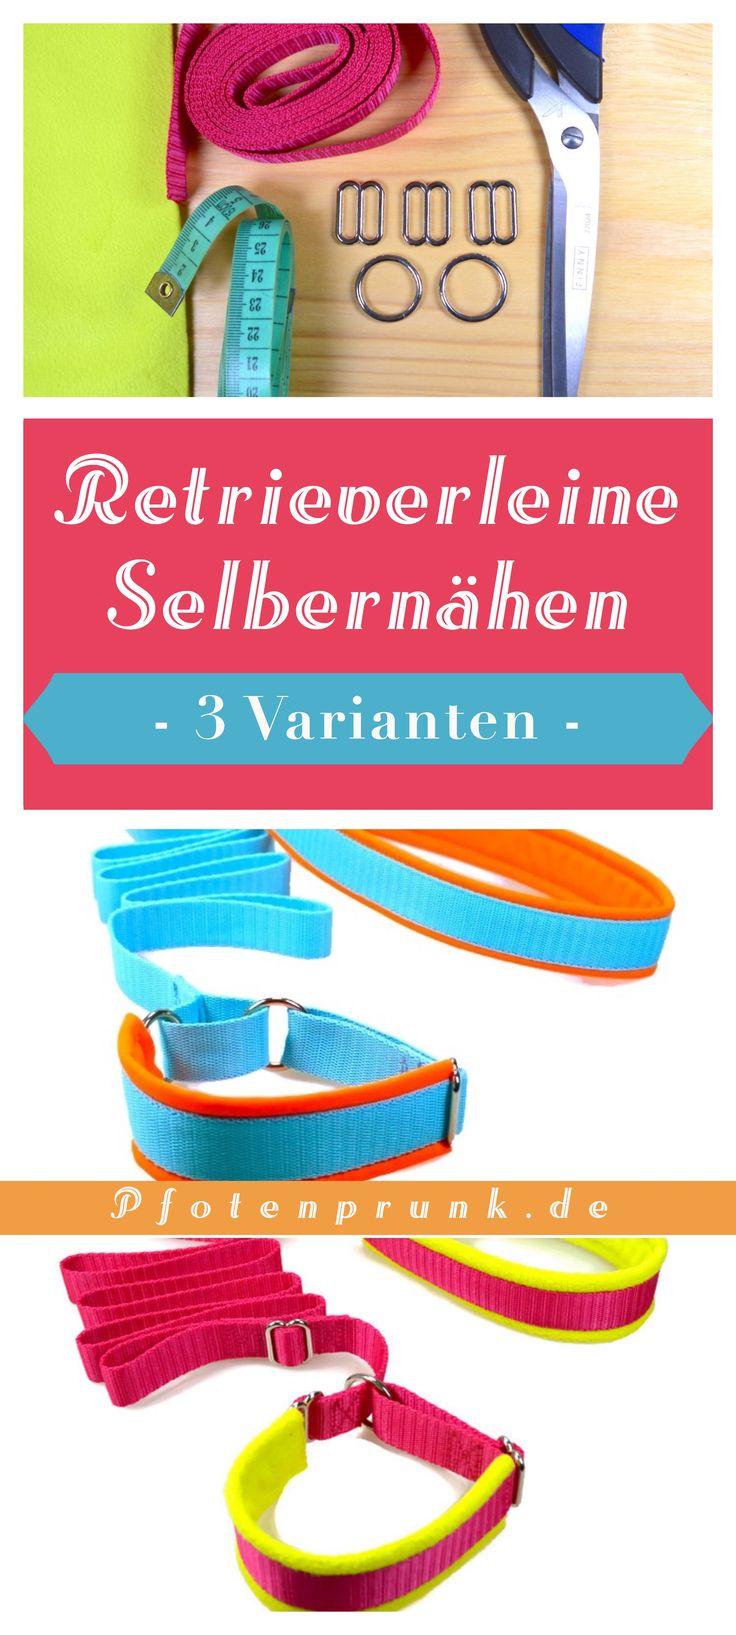 3 maneras de coser un Retrieverleine   – ♥ Pfotenprunk DIY – Anleitungen für Hunde (Hundehalsband, Geschirr, Leine, Basteln, Nähen, Betten, Halsband)